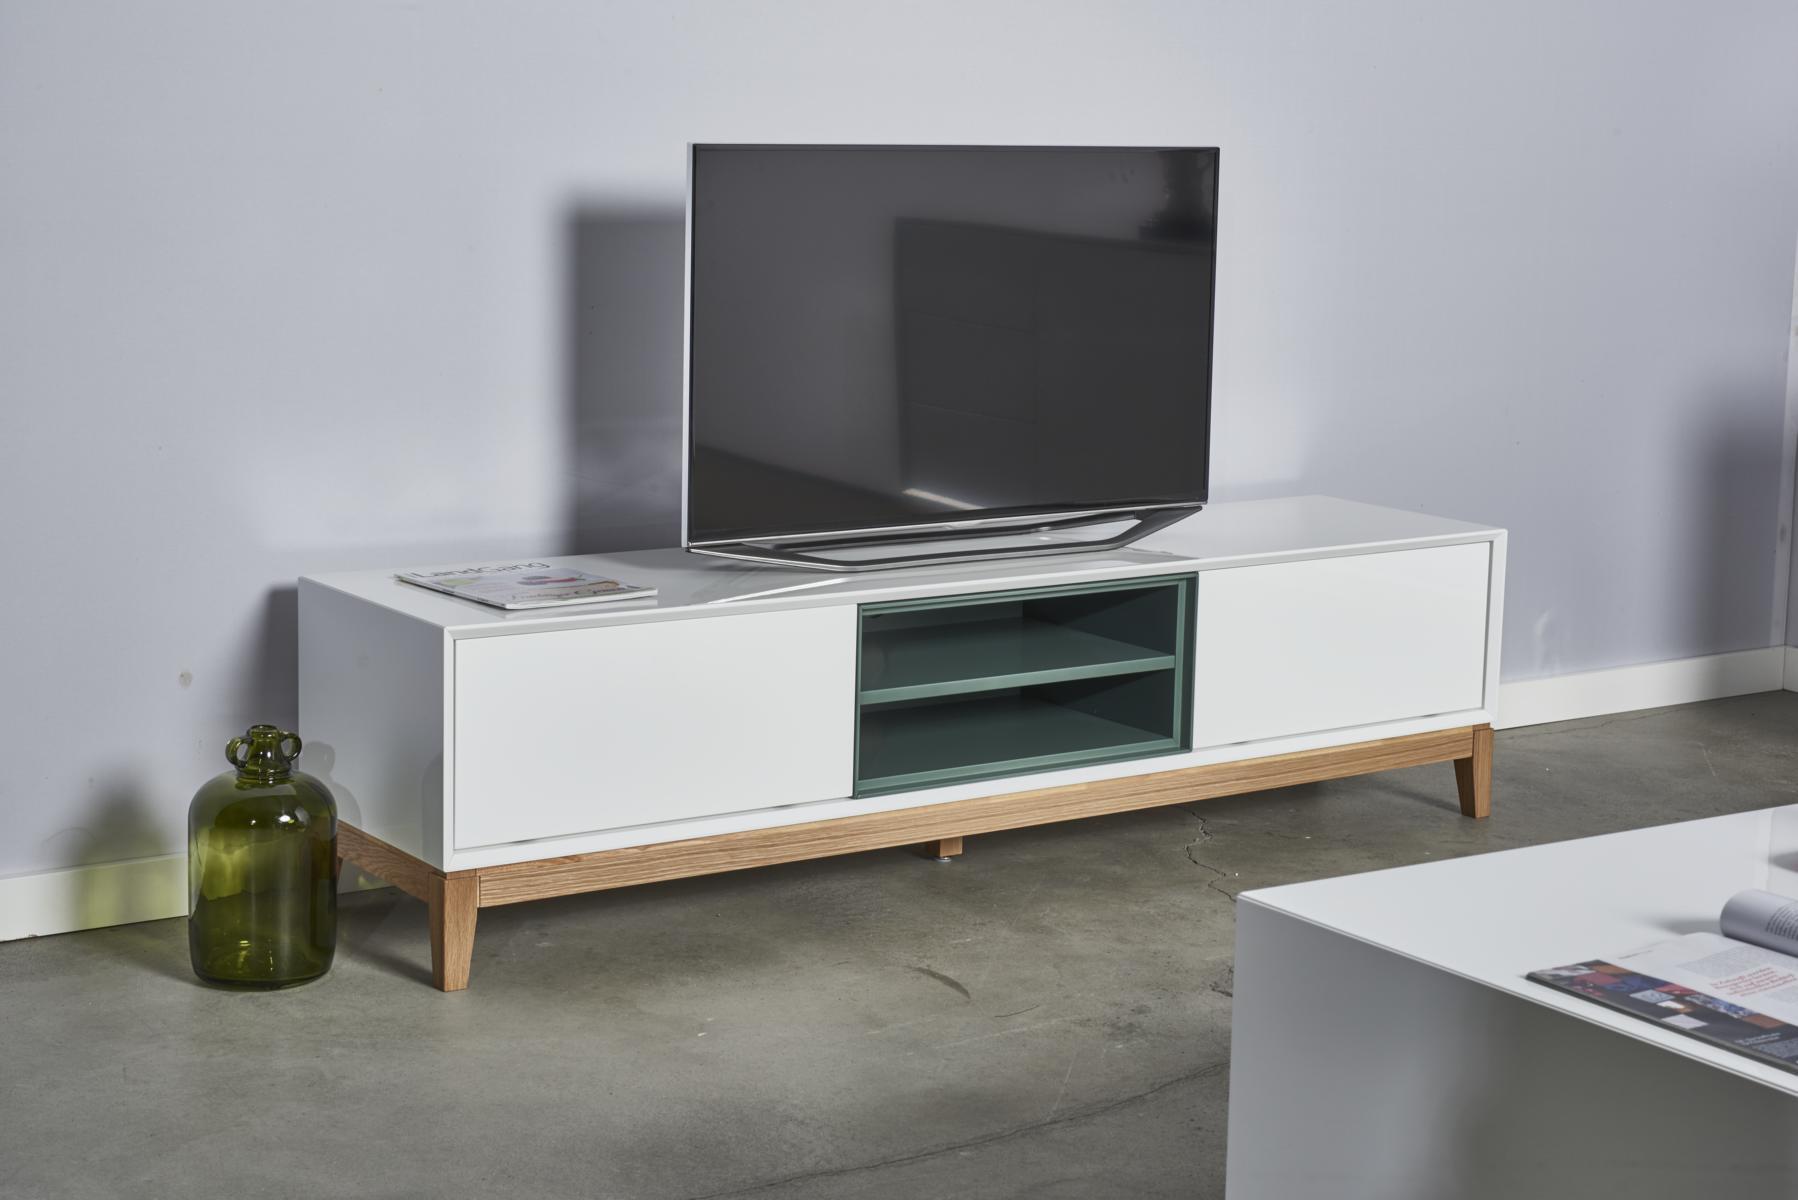 tv lowboard hegra grau gr n wei hochglanz gestell aus eiche massiv skandinavisches design. Black Bedroom Furniture Sets. Home Design Ideas